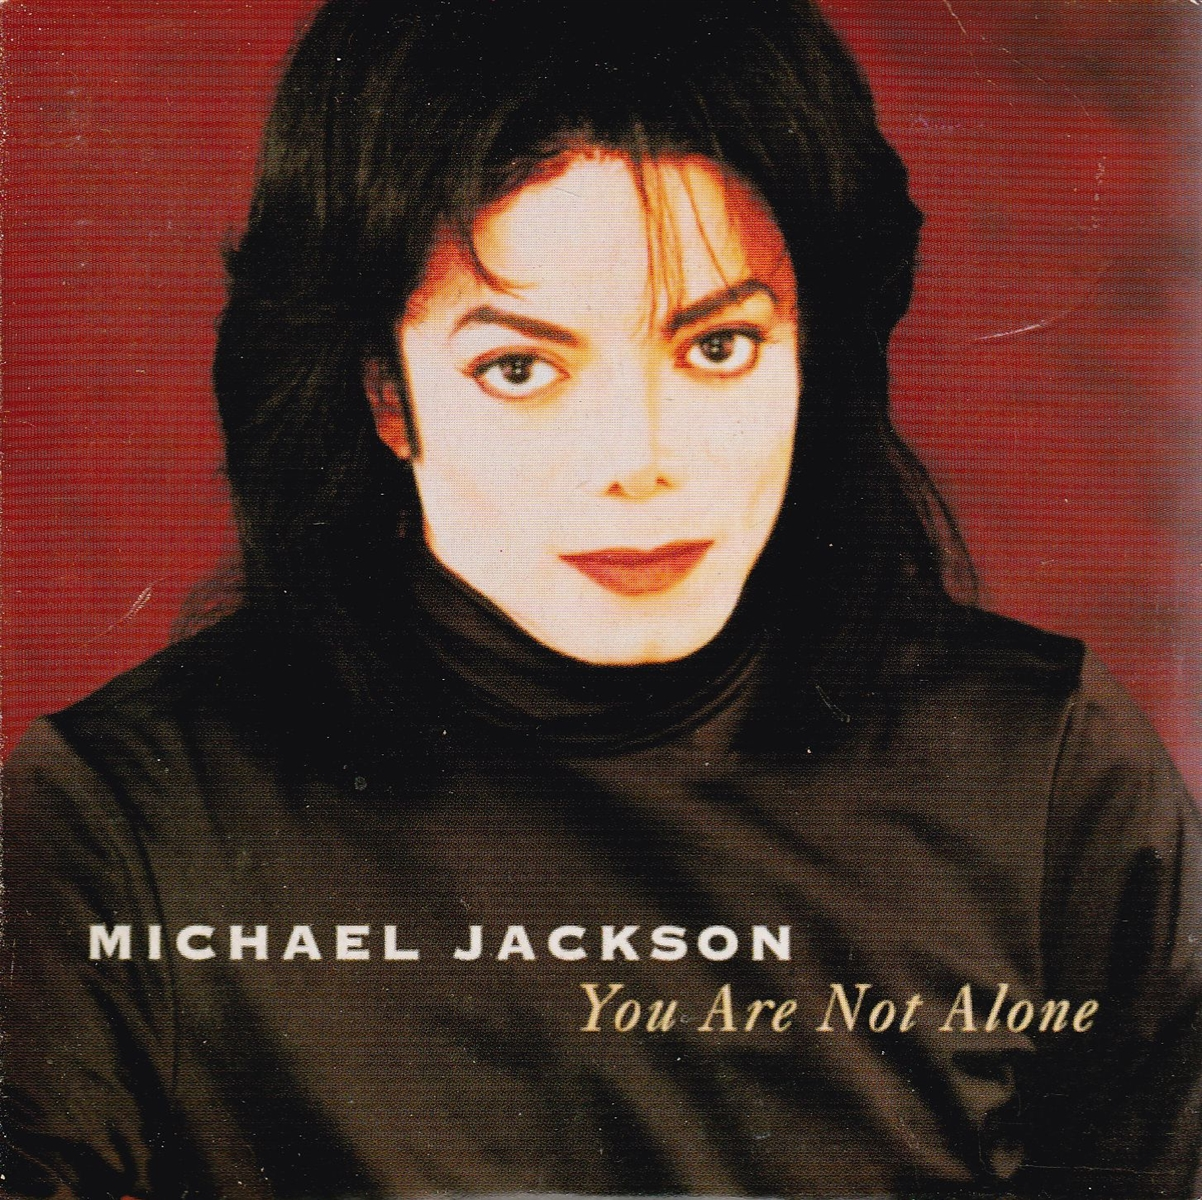 MICHAEL JACKSON - You're not alone - CD single